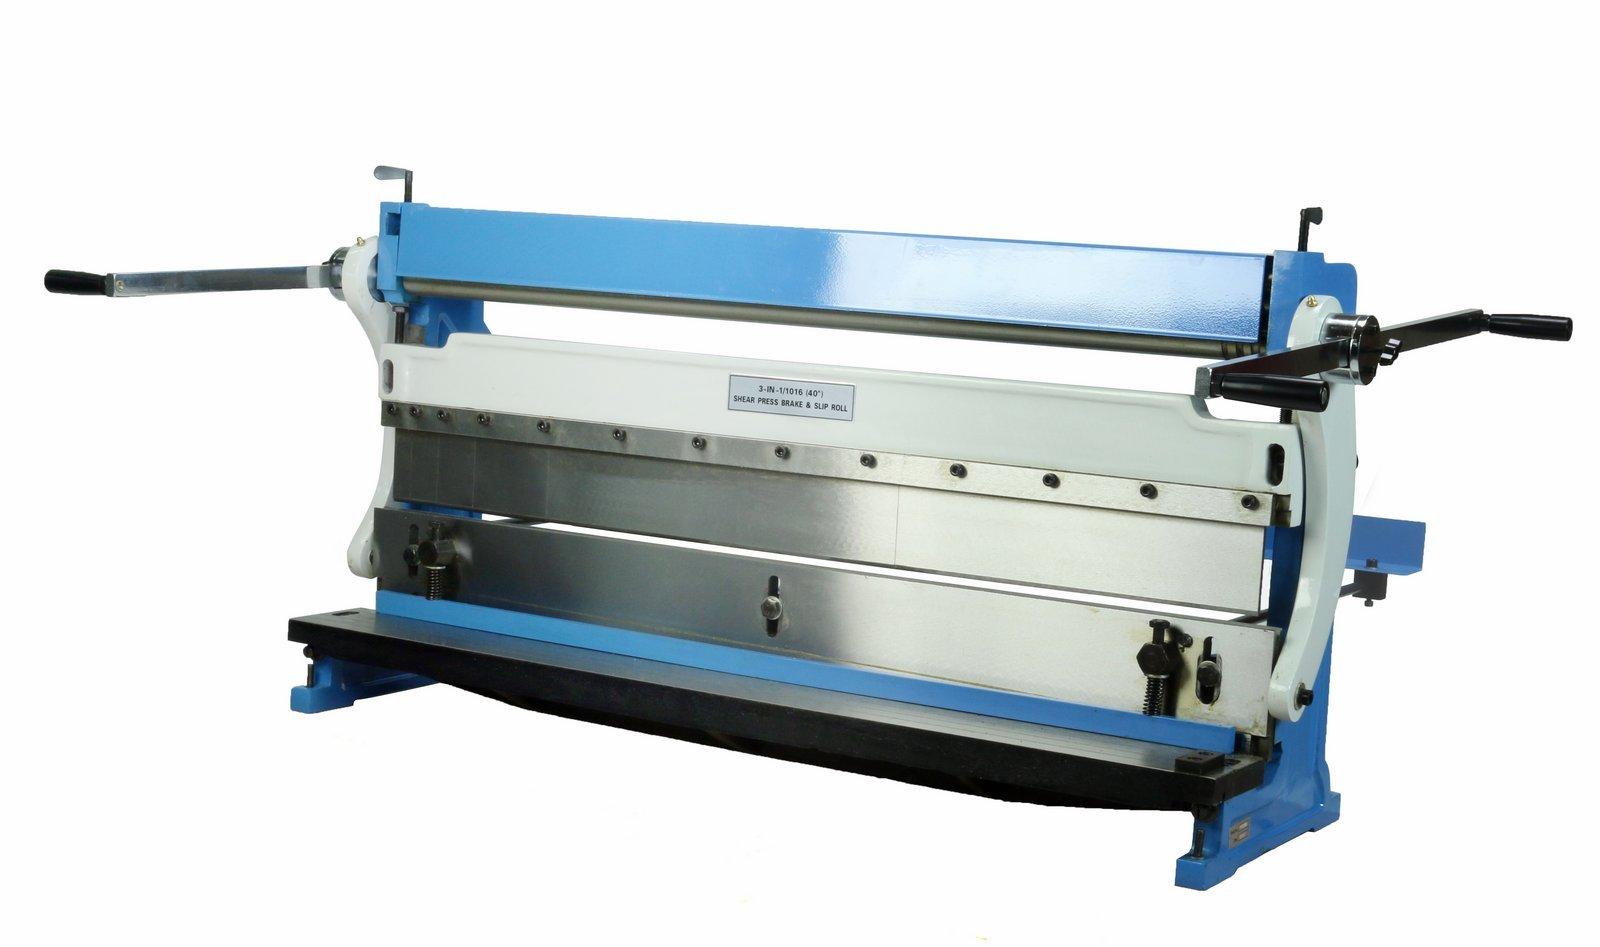 40'' Combination 3 in 1 Sheet Metal Shear, Brake & Slip Roll Combo Machine up to 20 Gauge